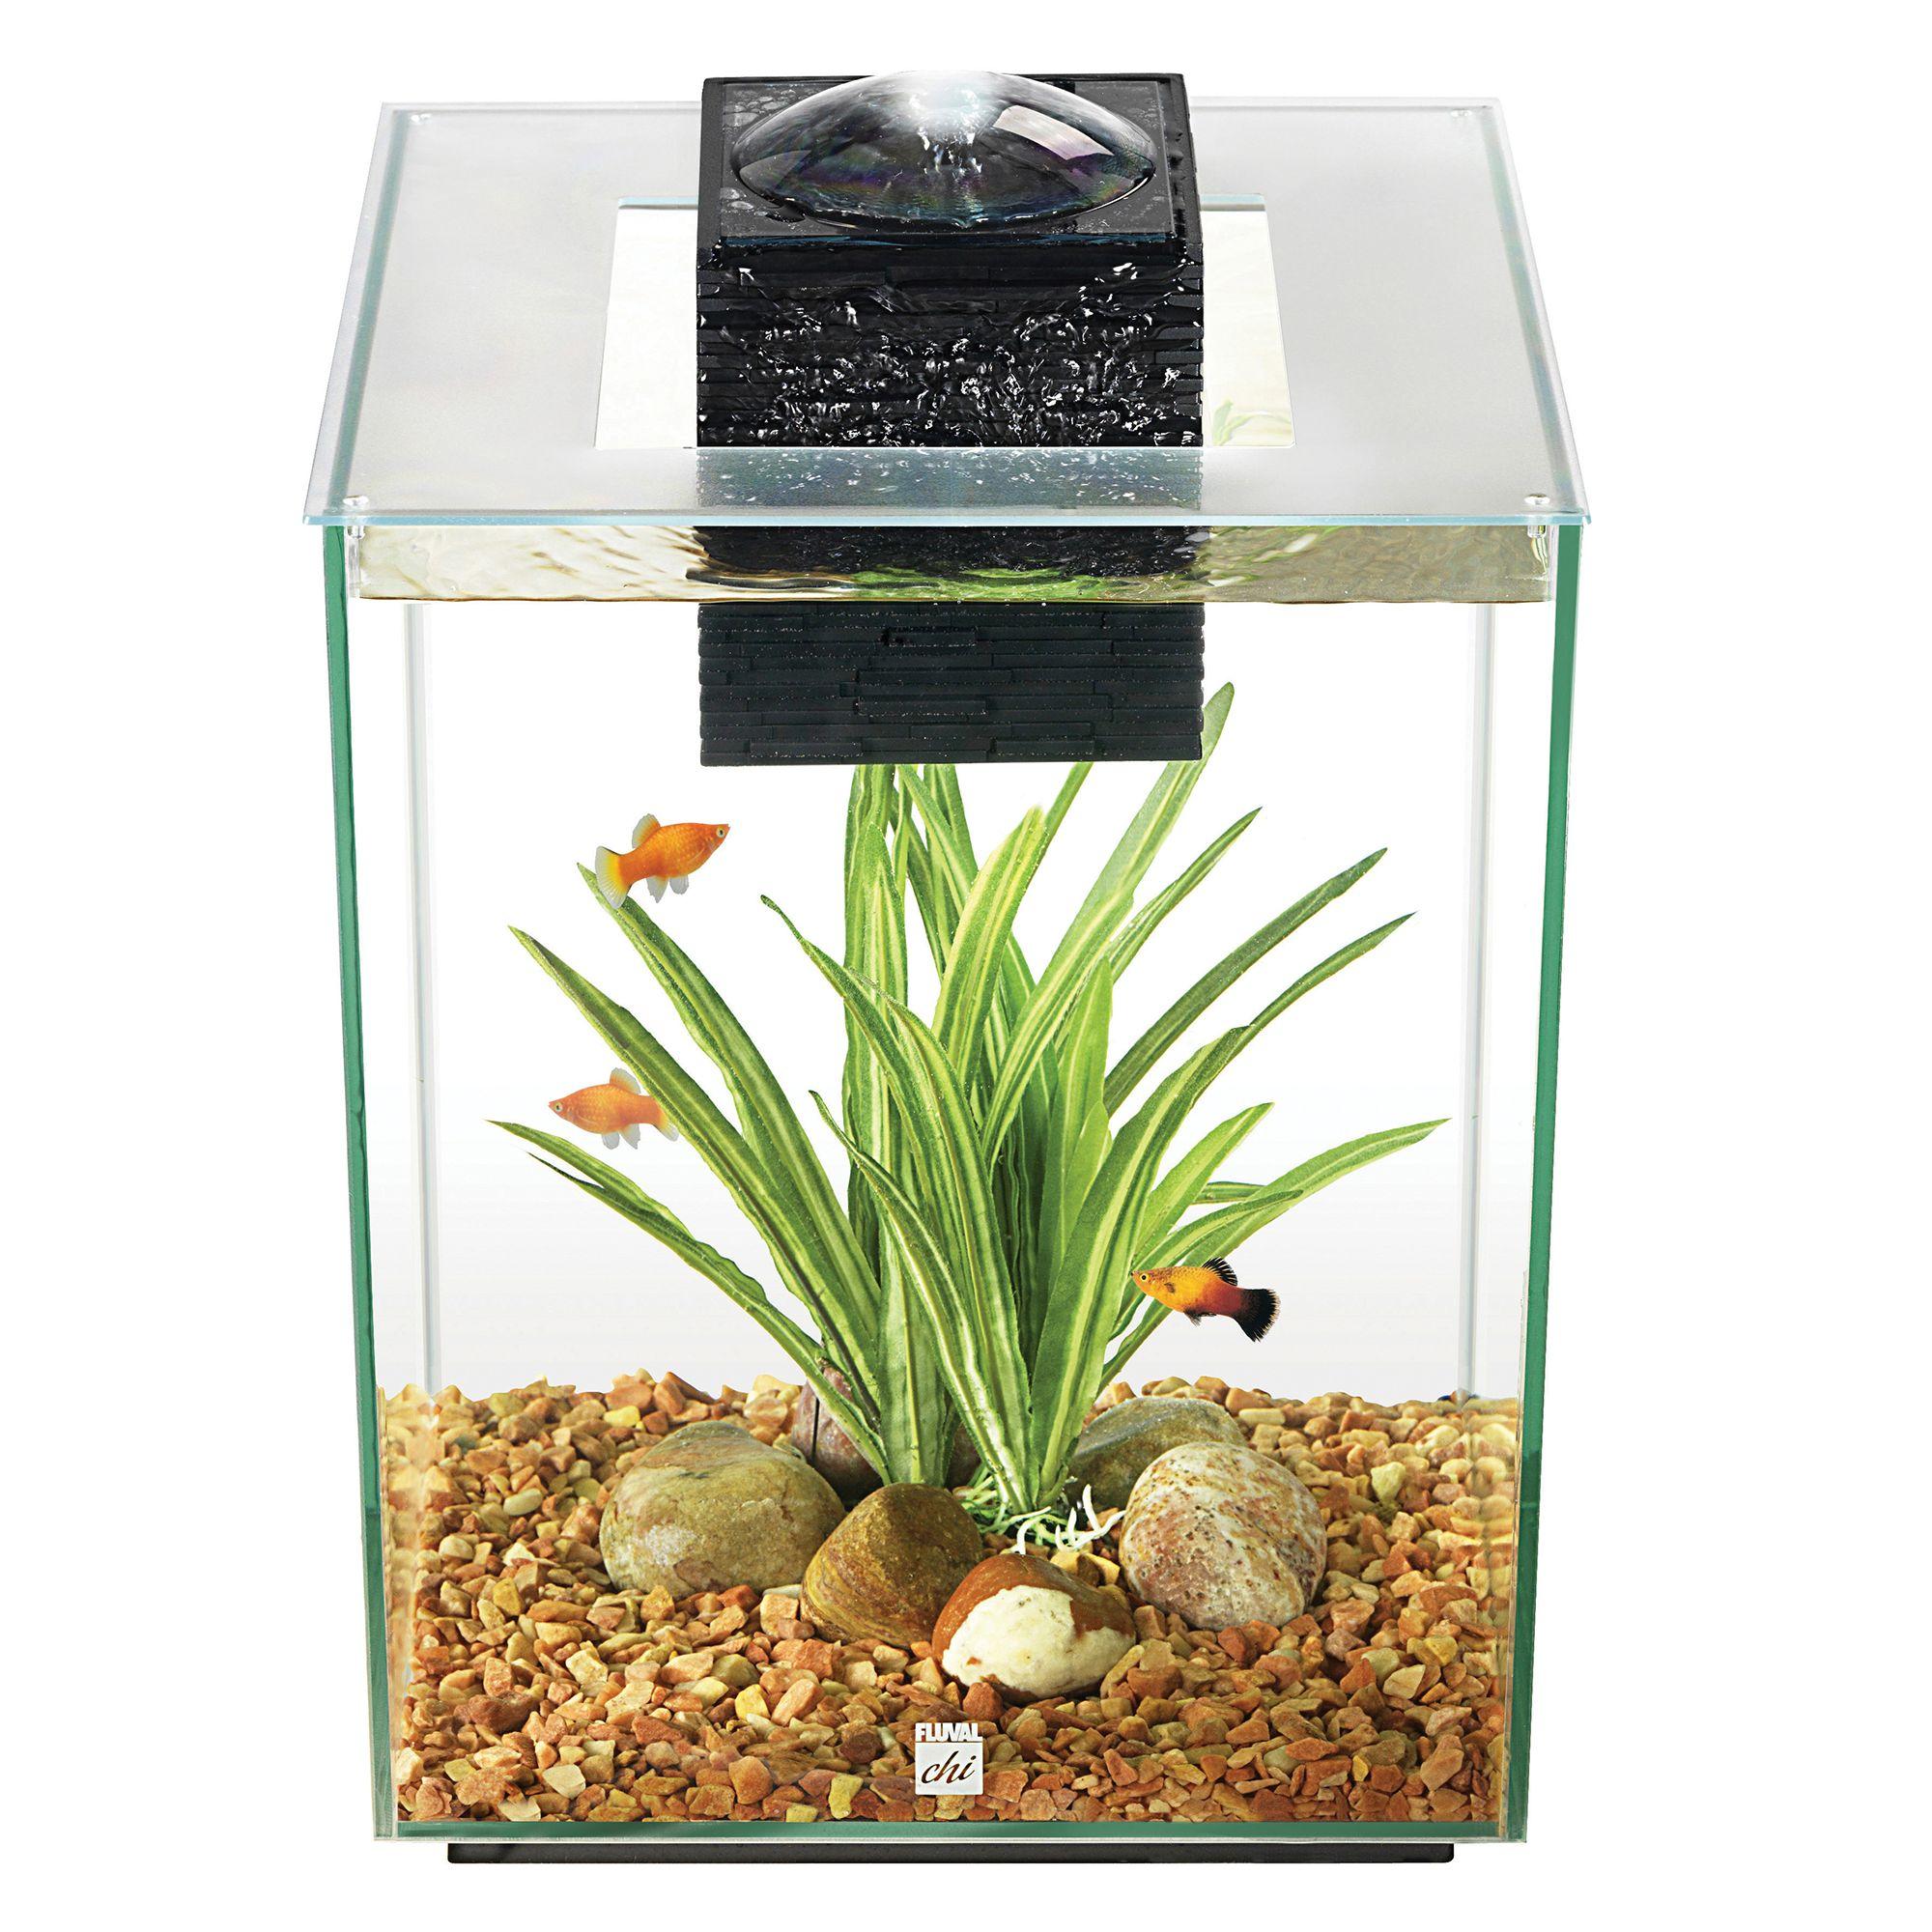 Fluval 5 Gallon Chi Aquarium Kit